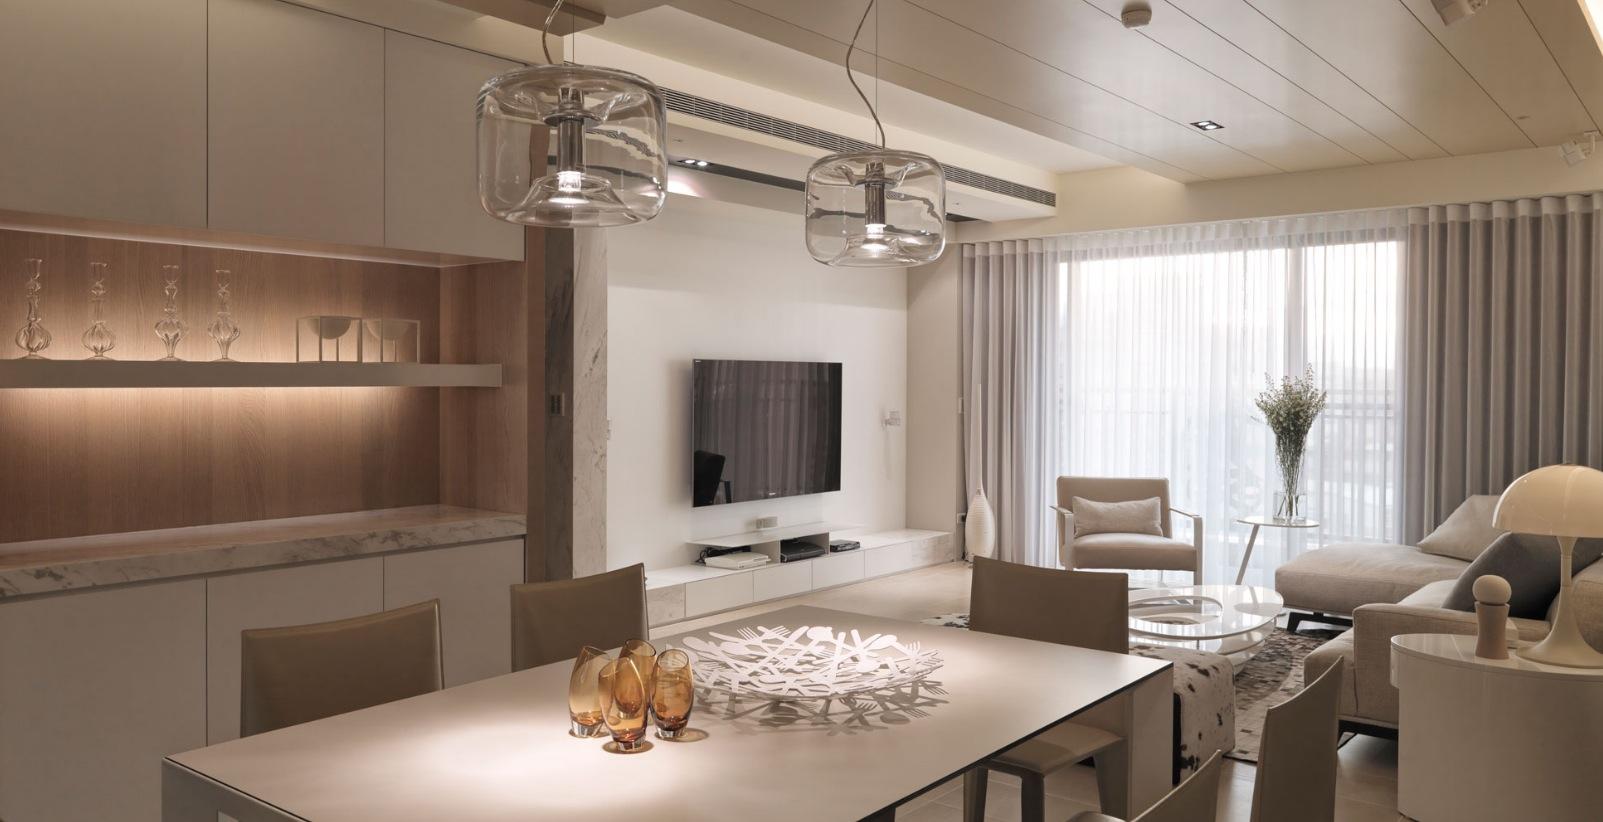 Ligne roset cloud spoonful of home design for Interior design appartamenti